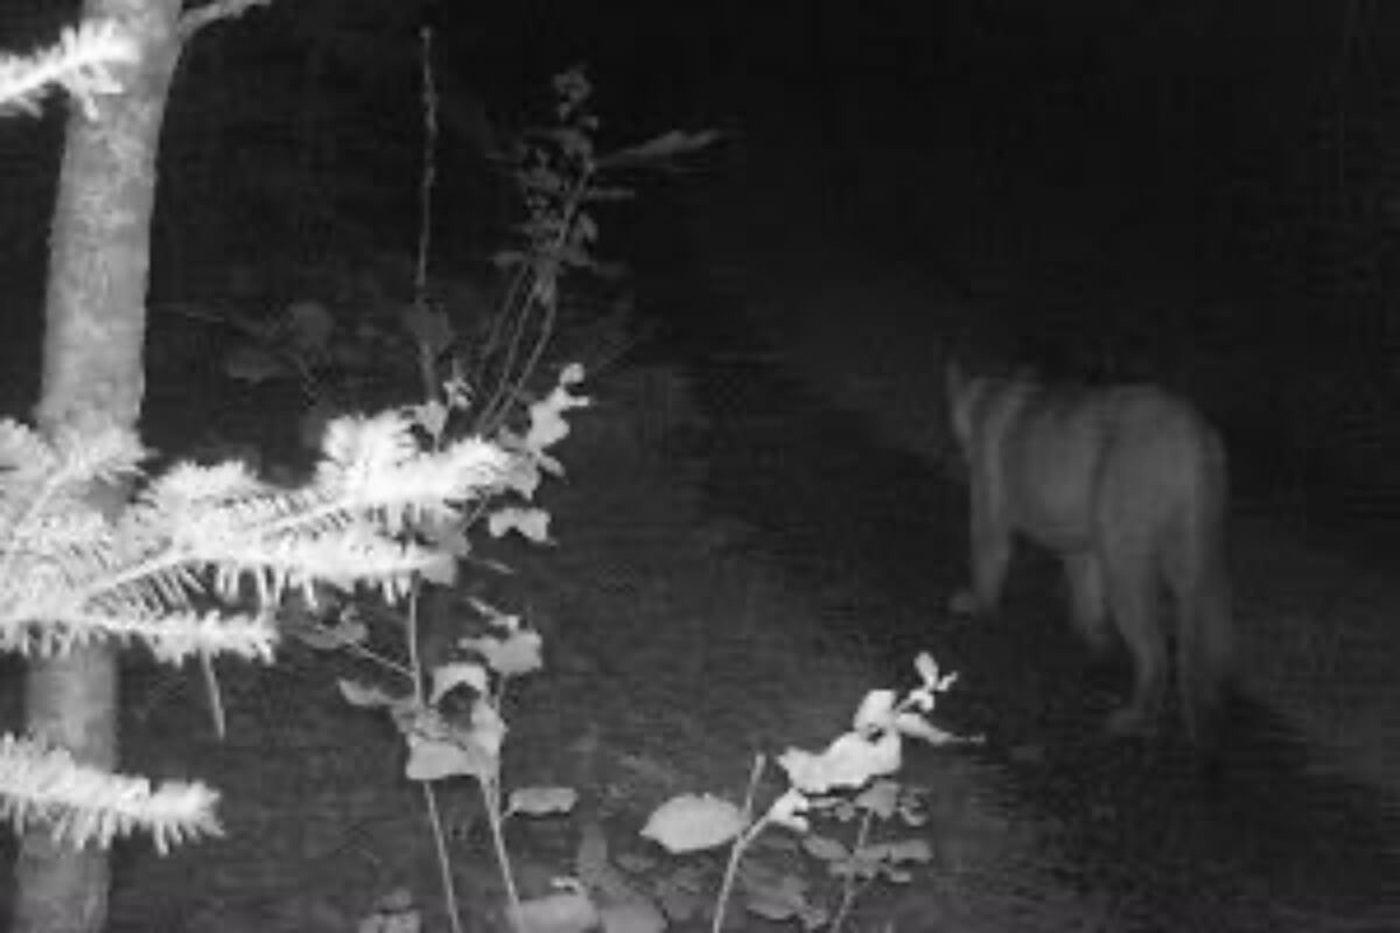 Photo via Michigan Department of Natural Resources